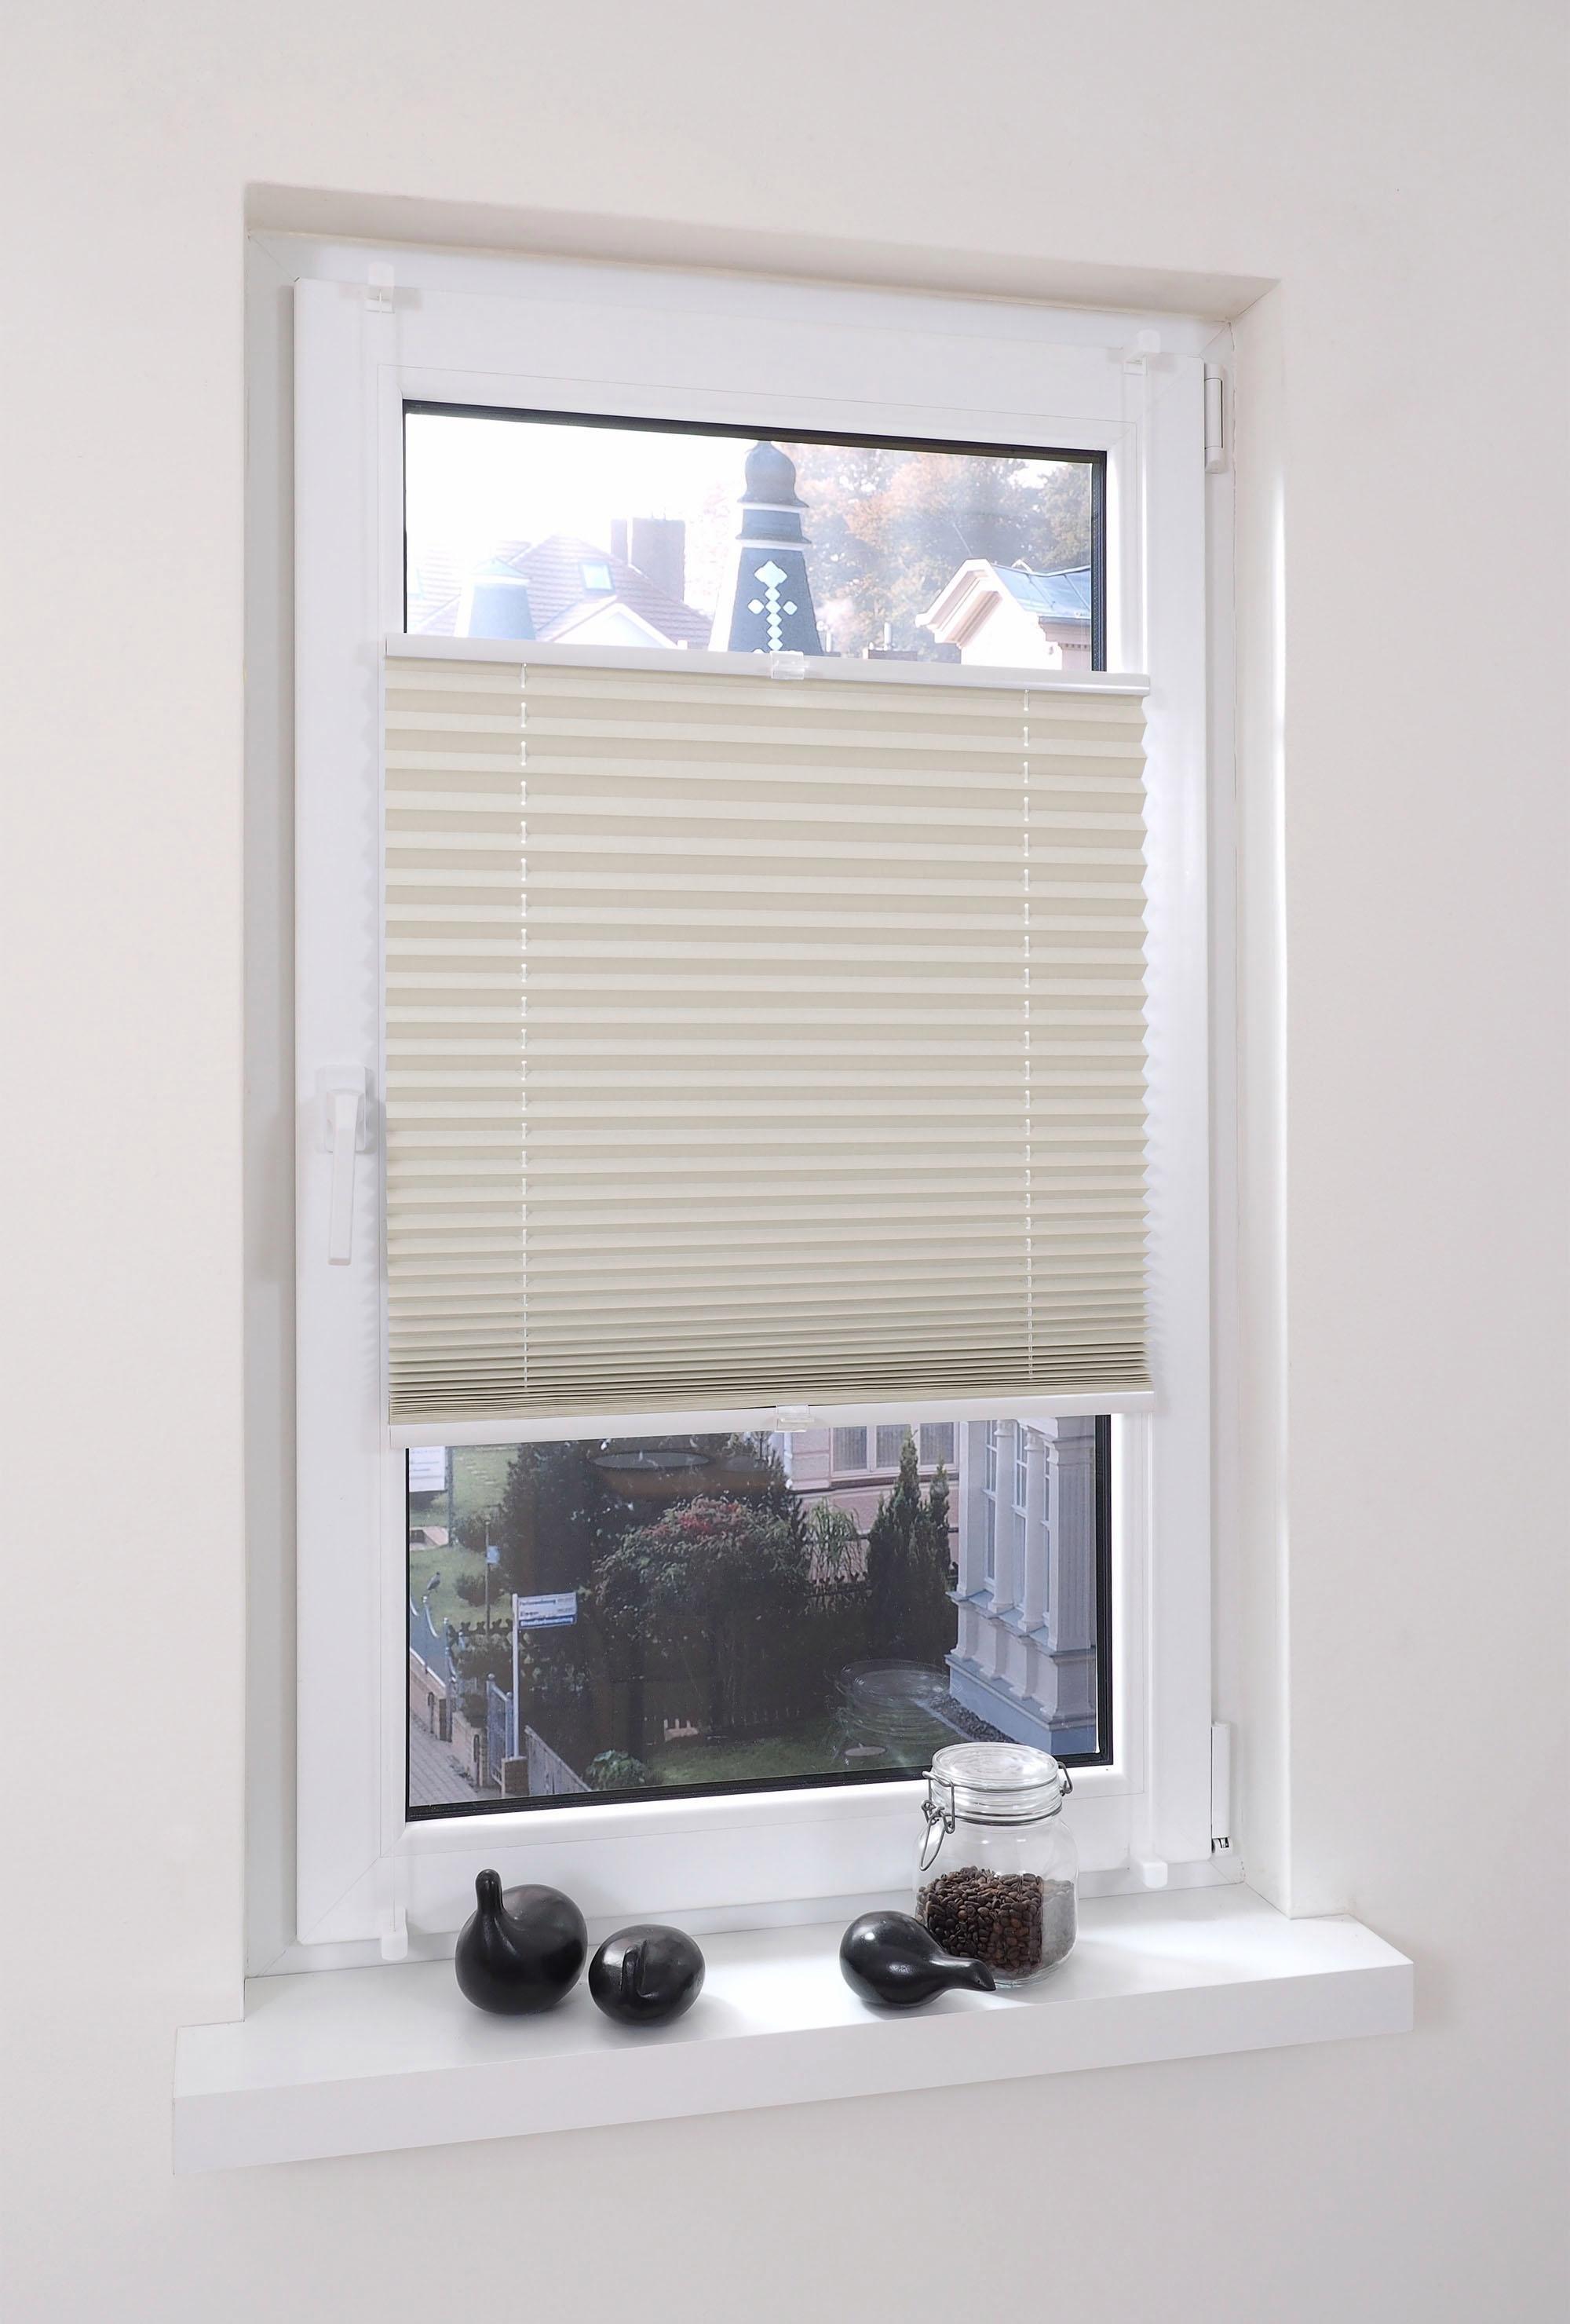 klemmfix thermo pliss liedeco vouwgordijn verduisterend energiebesparend standaardmaat in. Black Bedroom Furniture Sets. Home Design Ideas